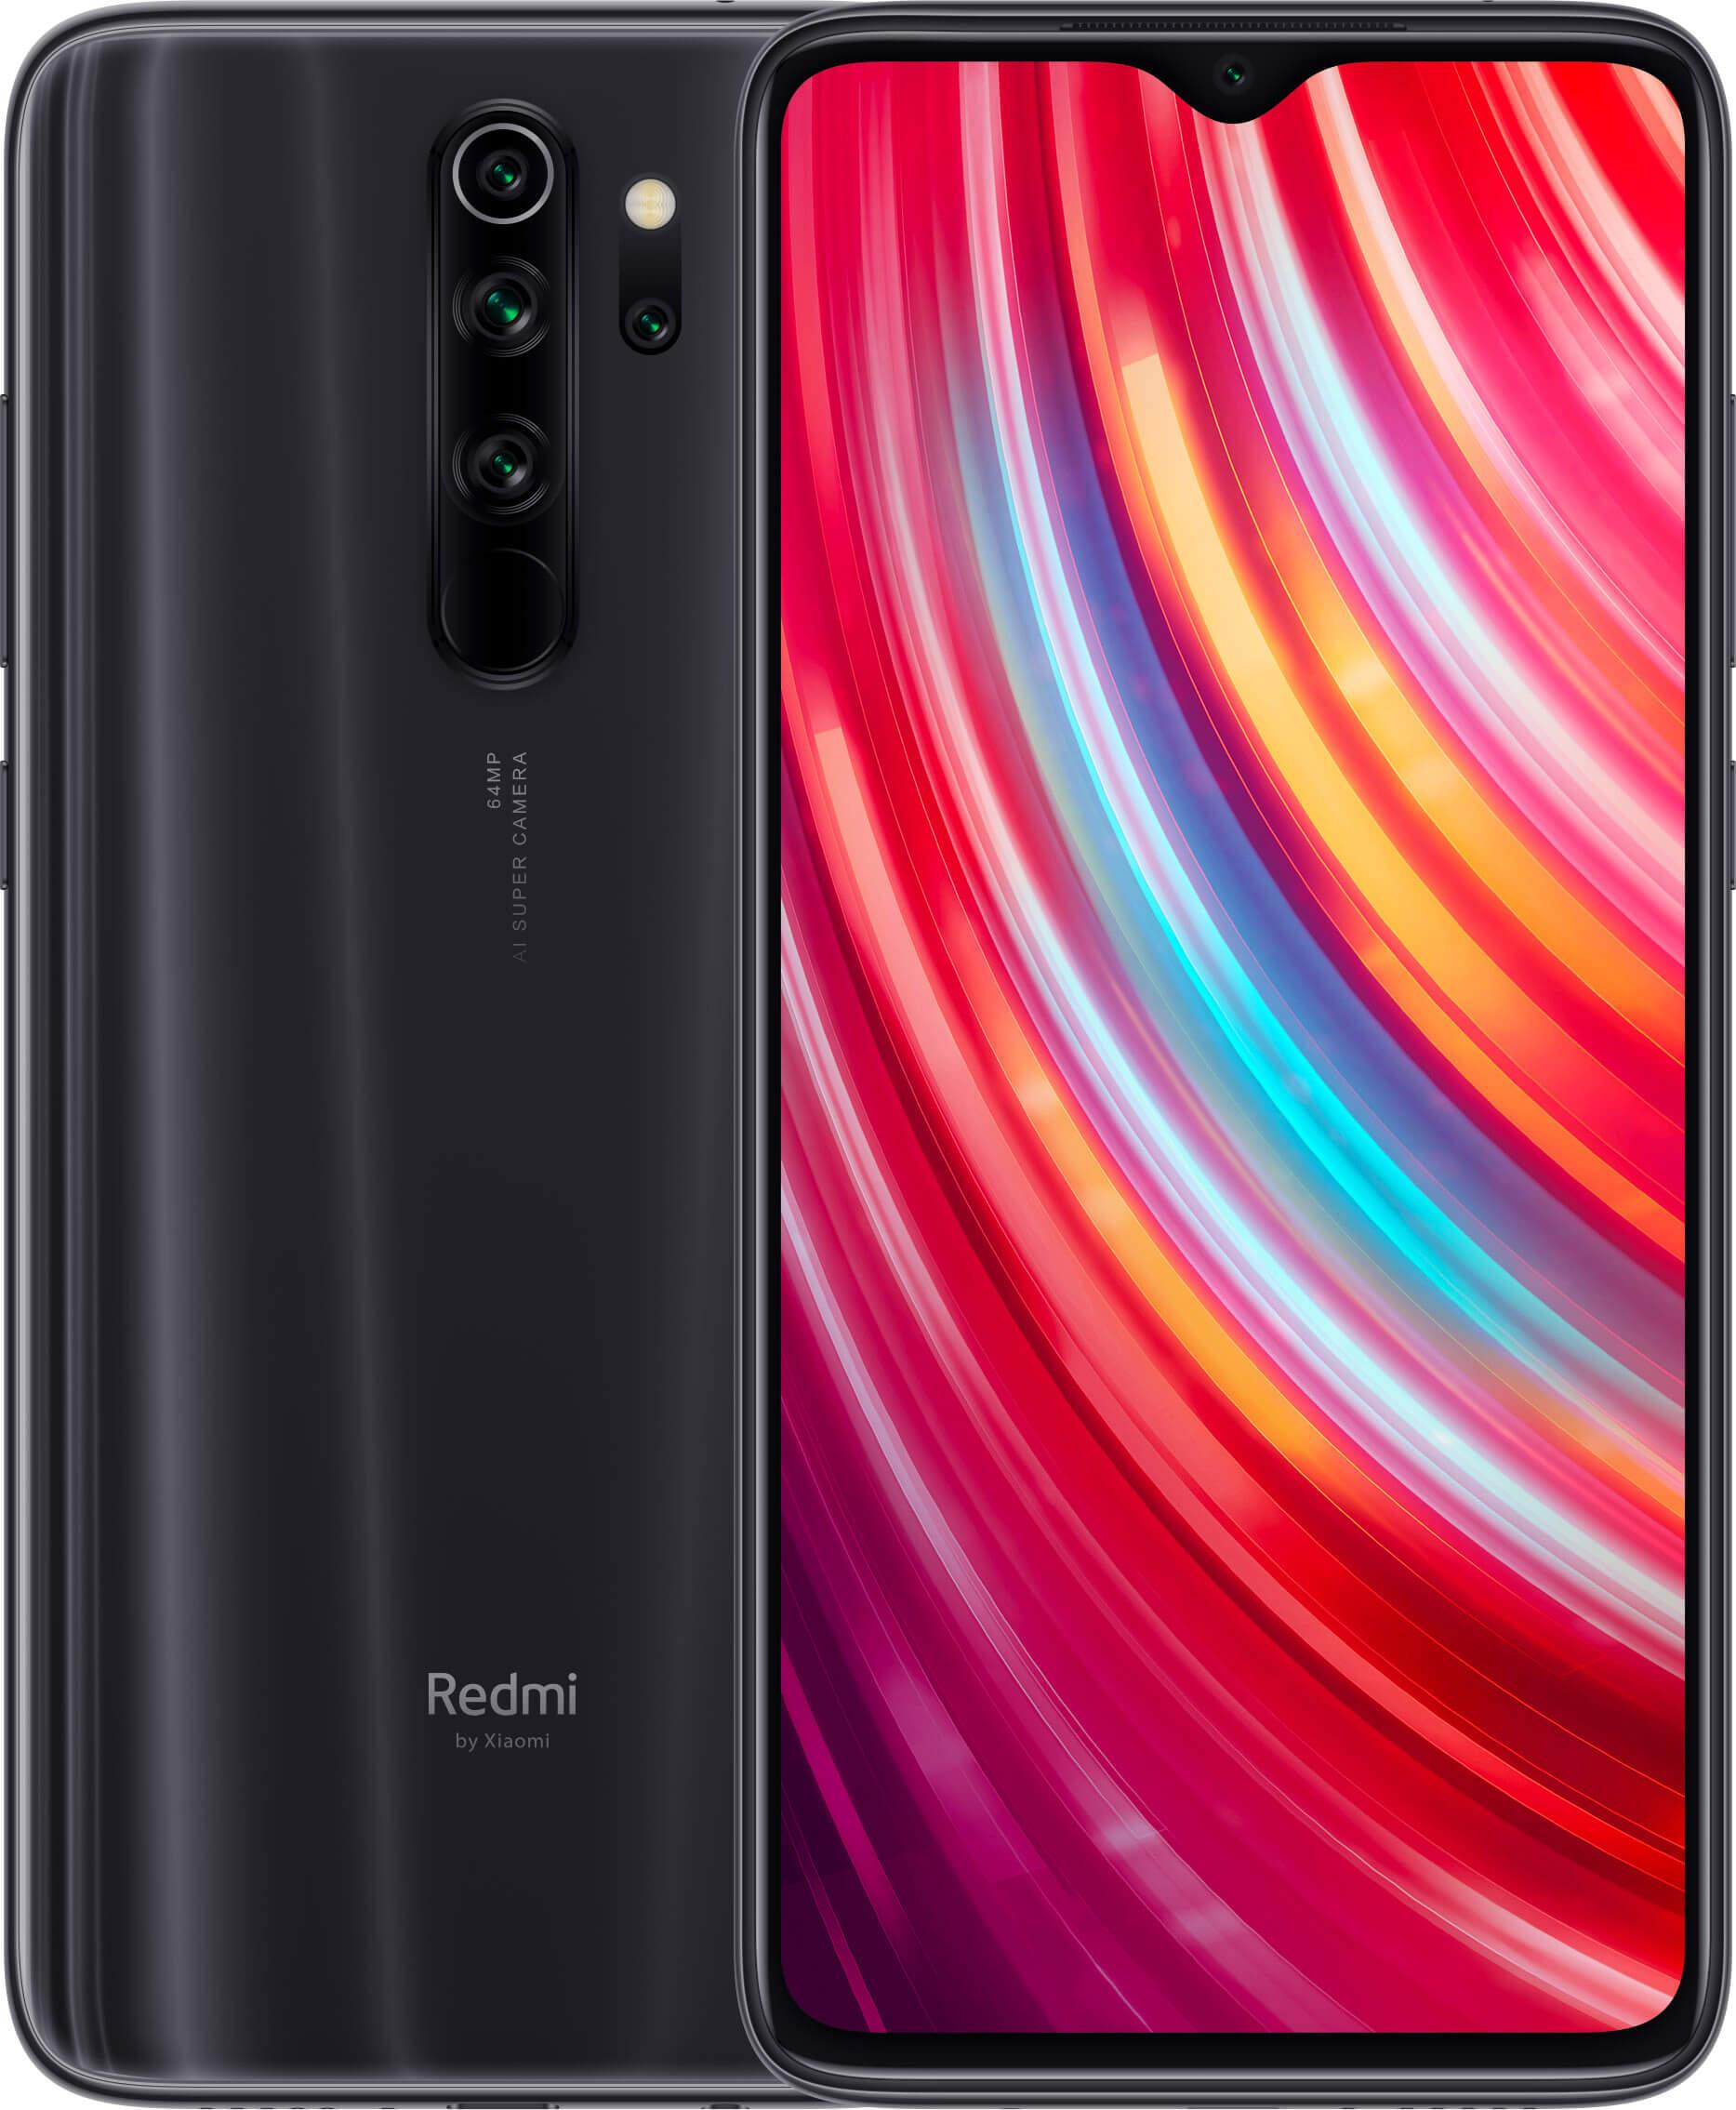 Xiaomi Redmi Note 8 PRO Dual SIM - 128GB, 6GB RAM, 4G LTE, Mineral Grey Global Versia